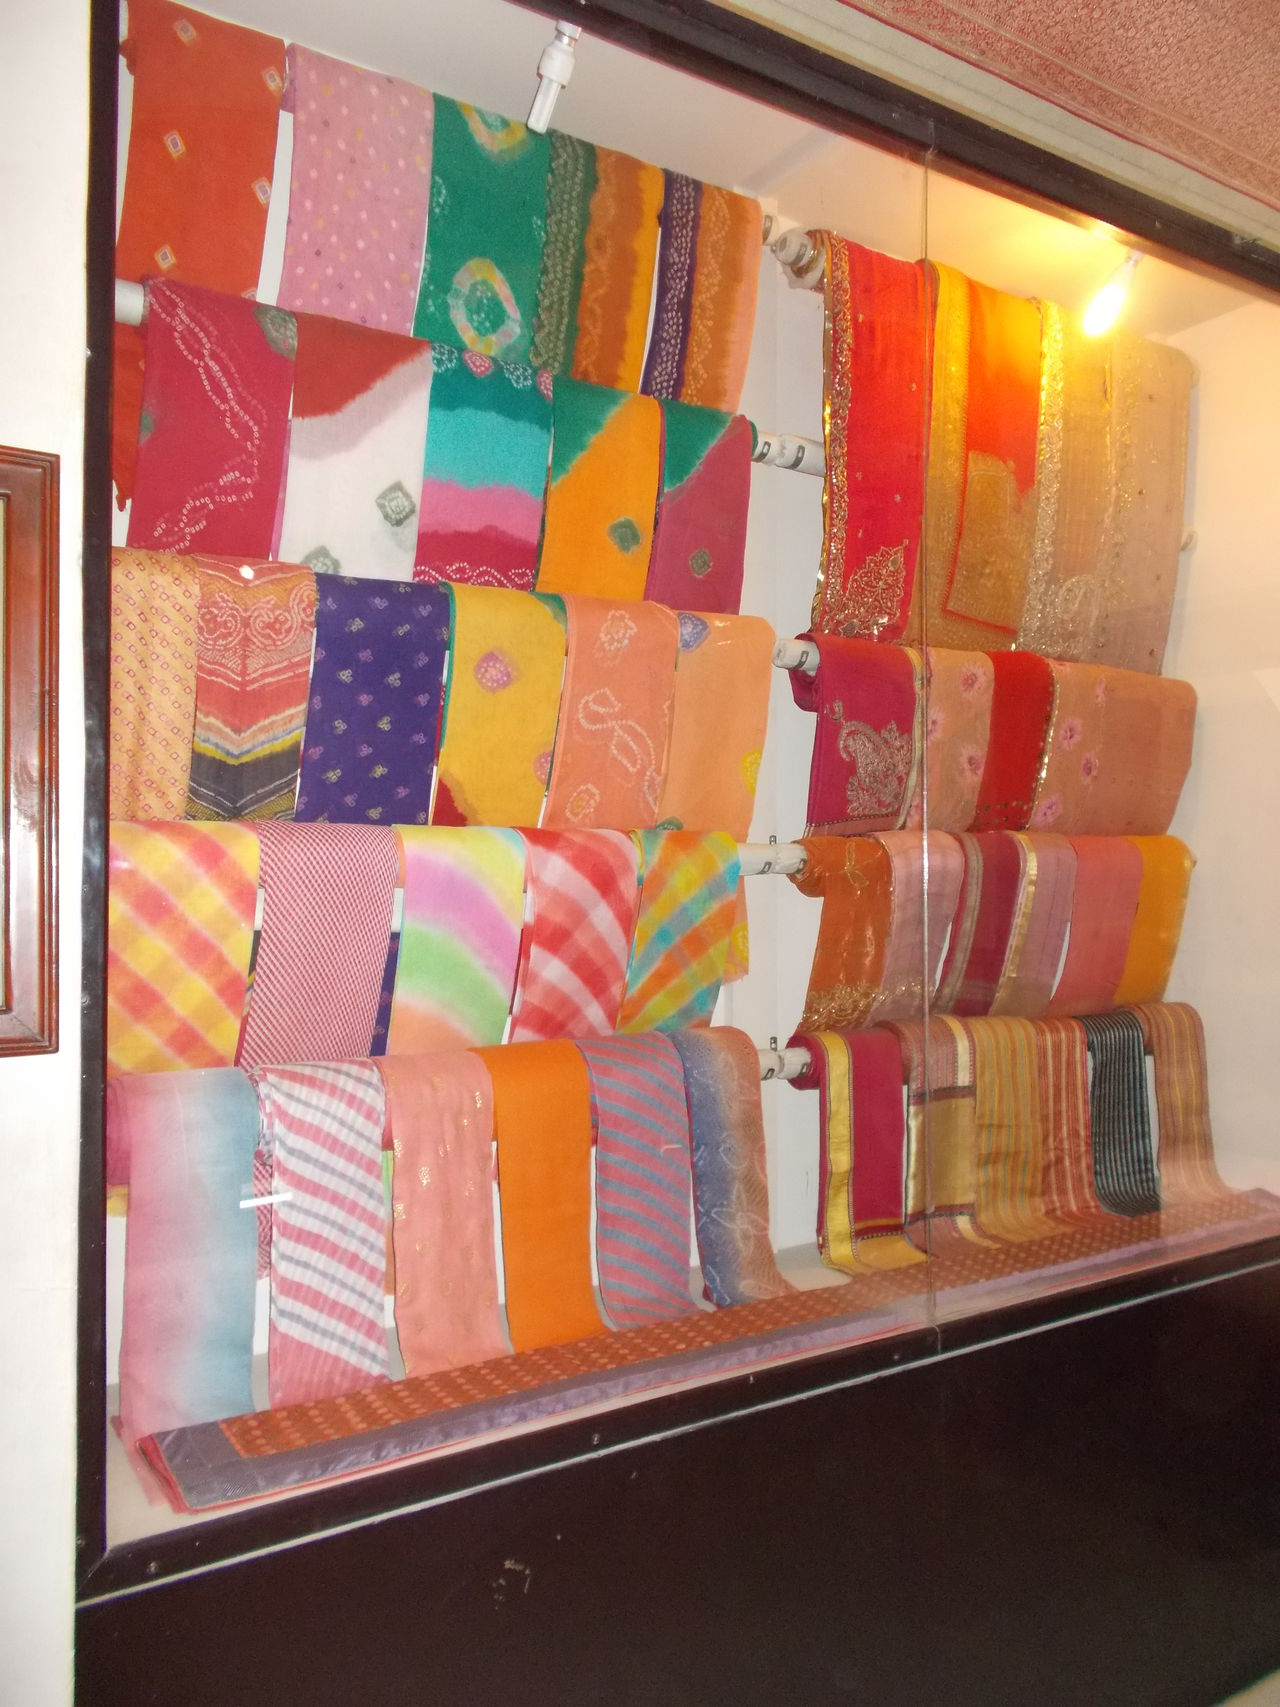 Traditional Clothing Traditional Culture Rajasthan Sarees Bandhani Sarees Bikaner Fort Craftsman Rajasthan_diaries Bikaner India History Through The Lens